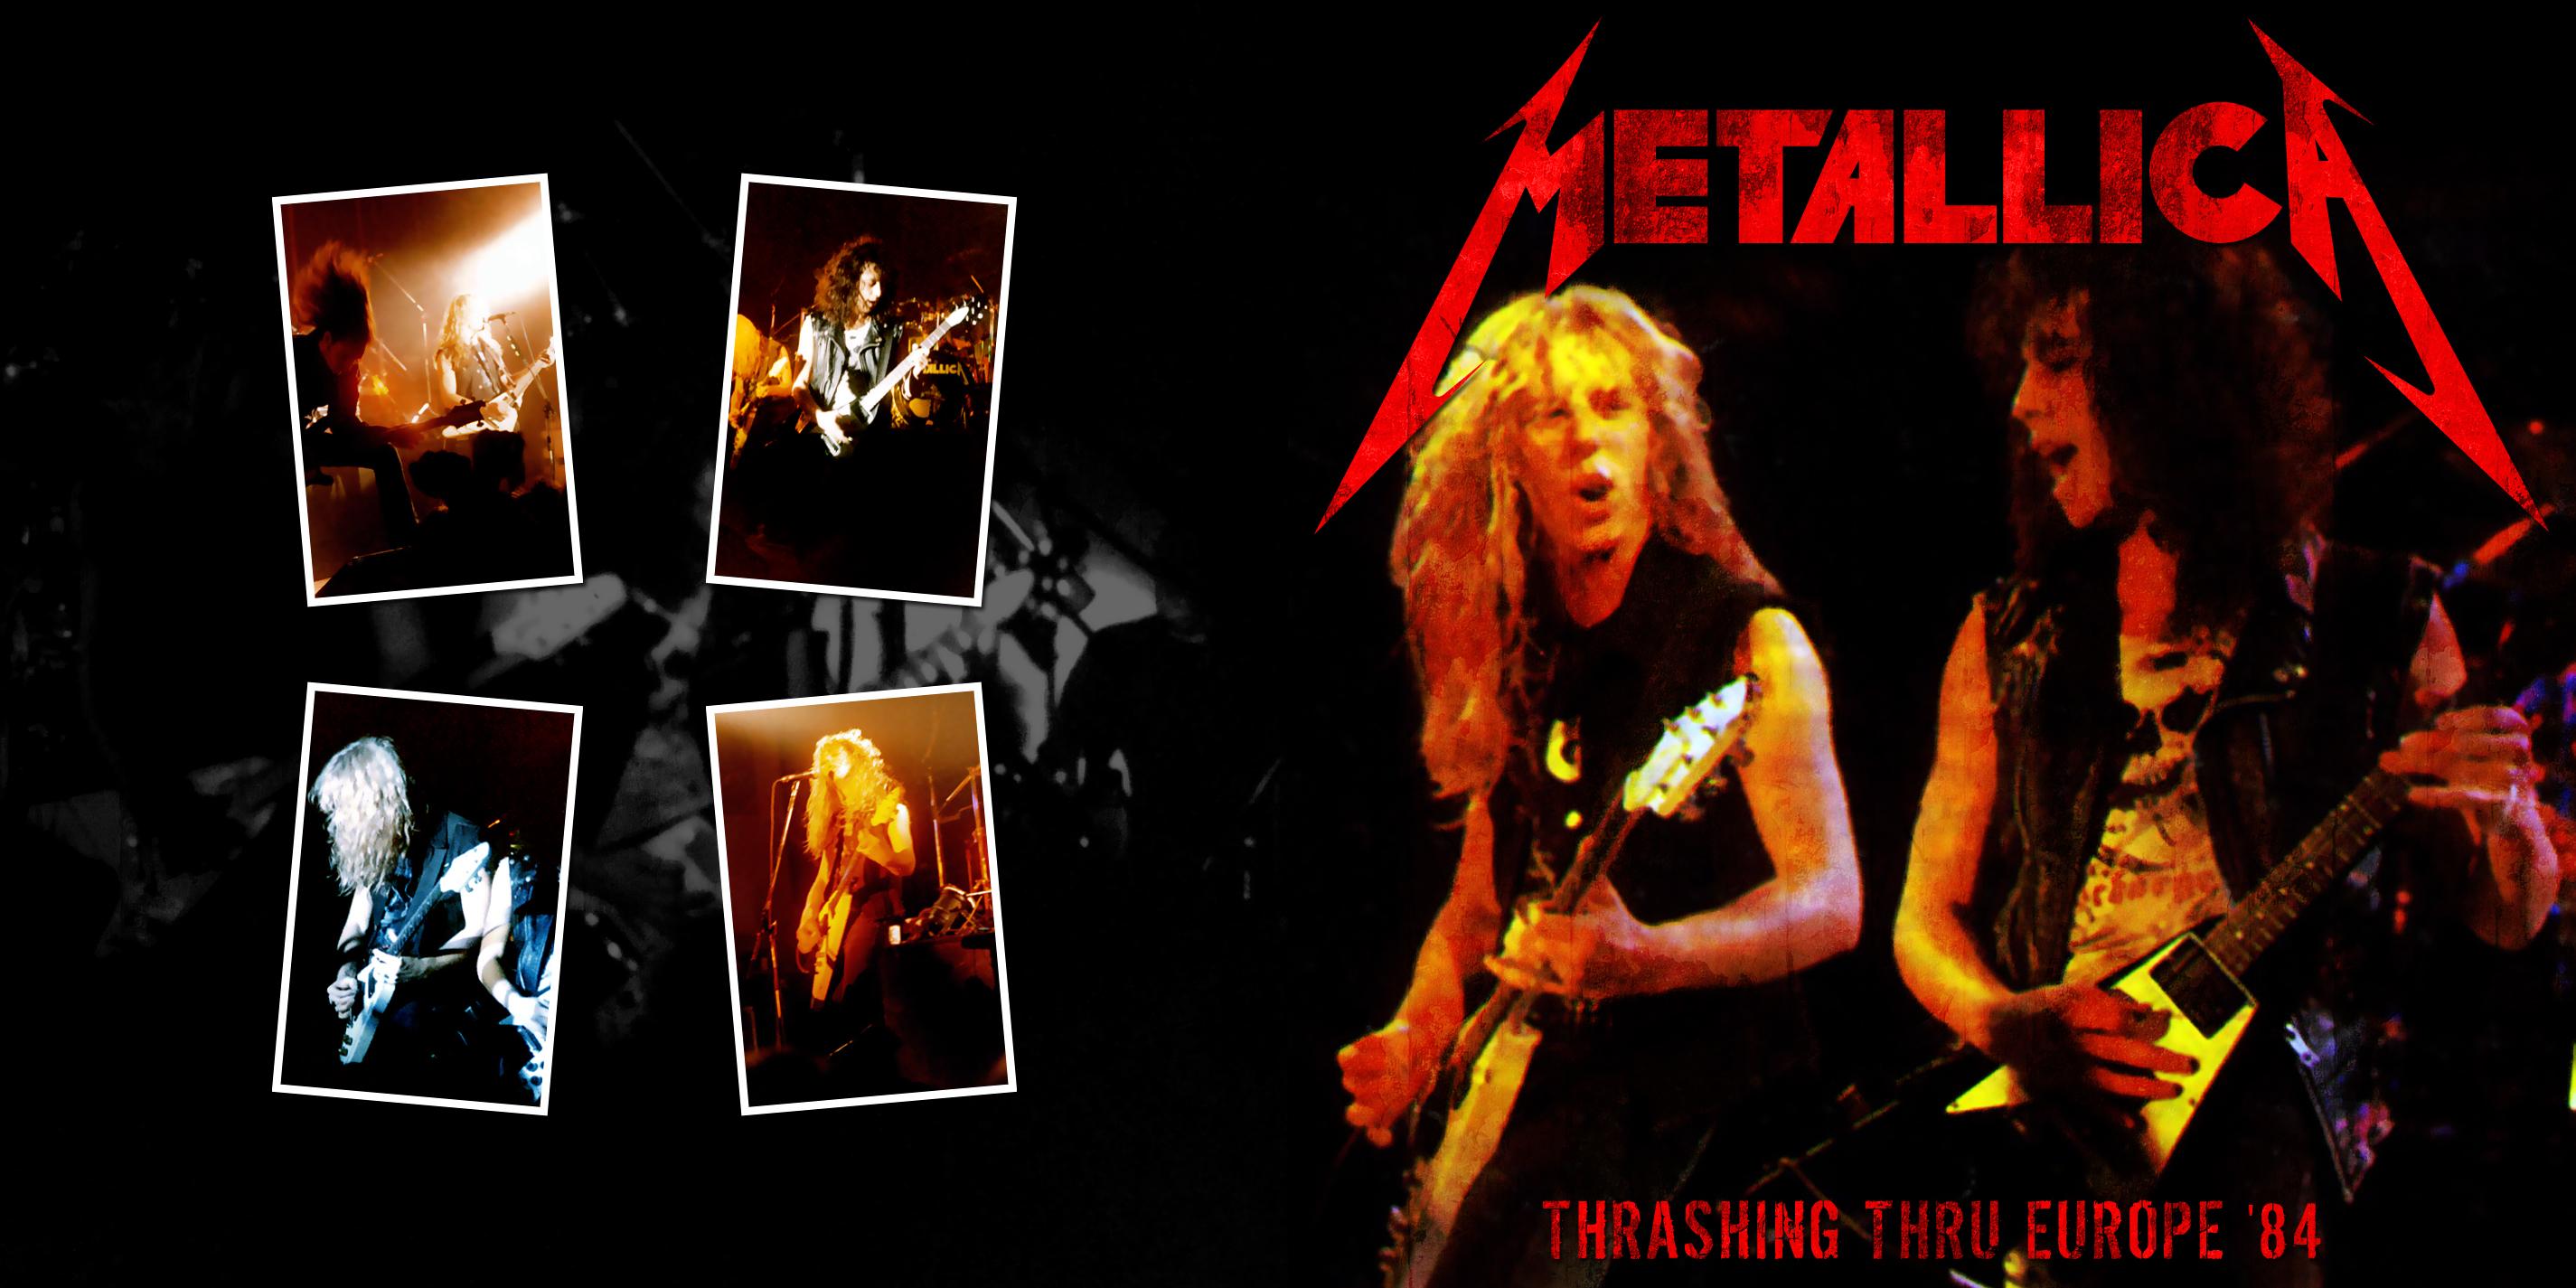 METALLICA thrash metal heavy album cover art fa wallpaper 2850x1425 2850x1425